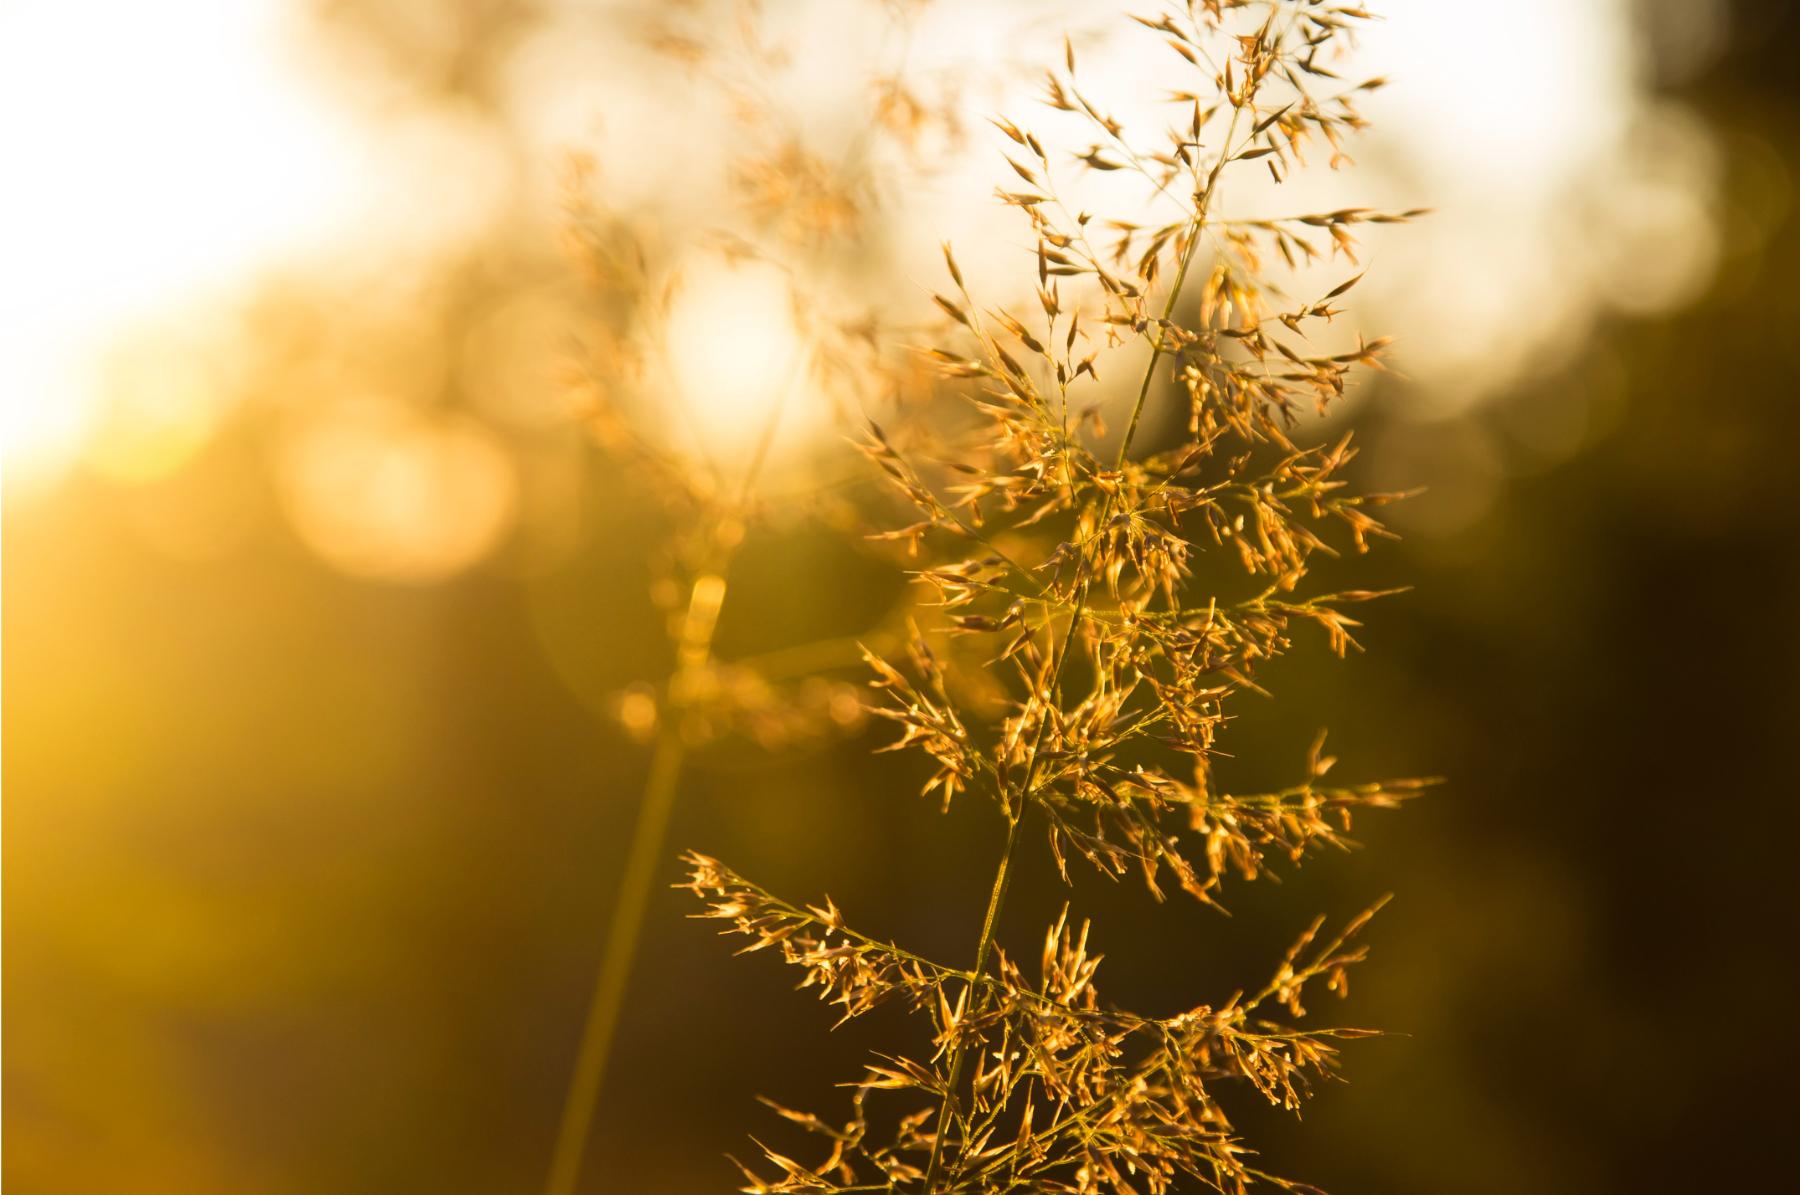 plant_golden_sunset_contrast_depth of fi